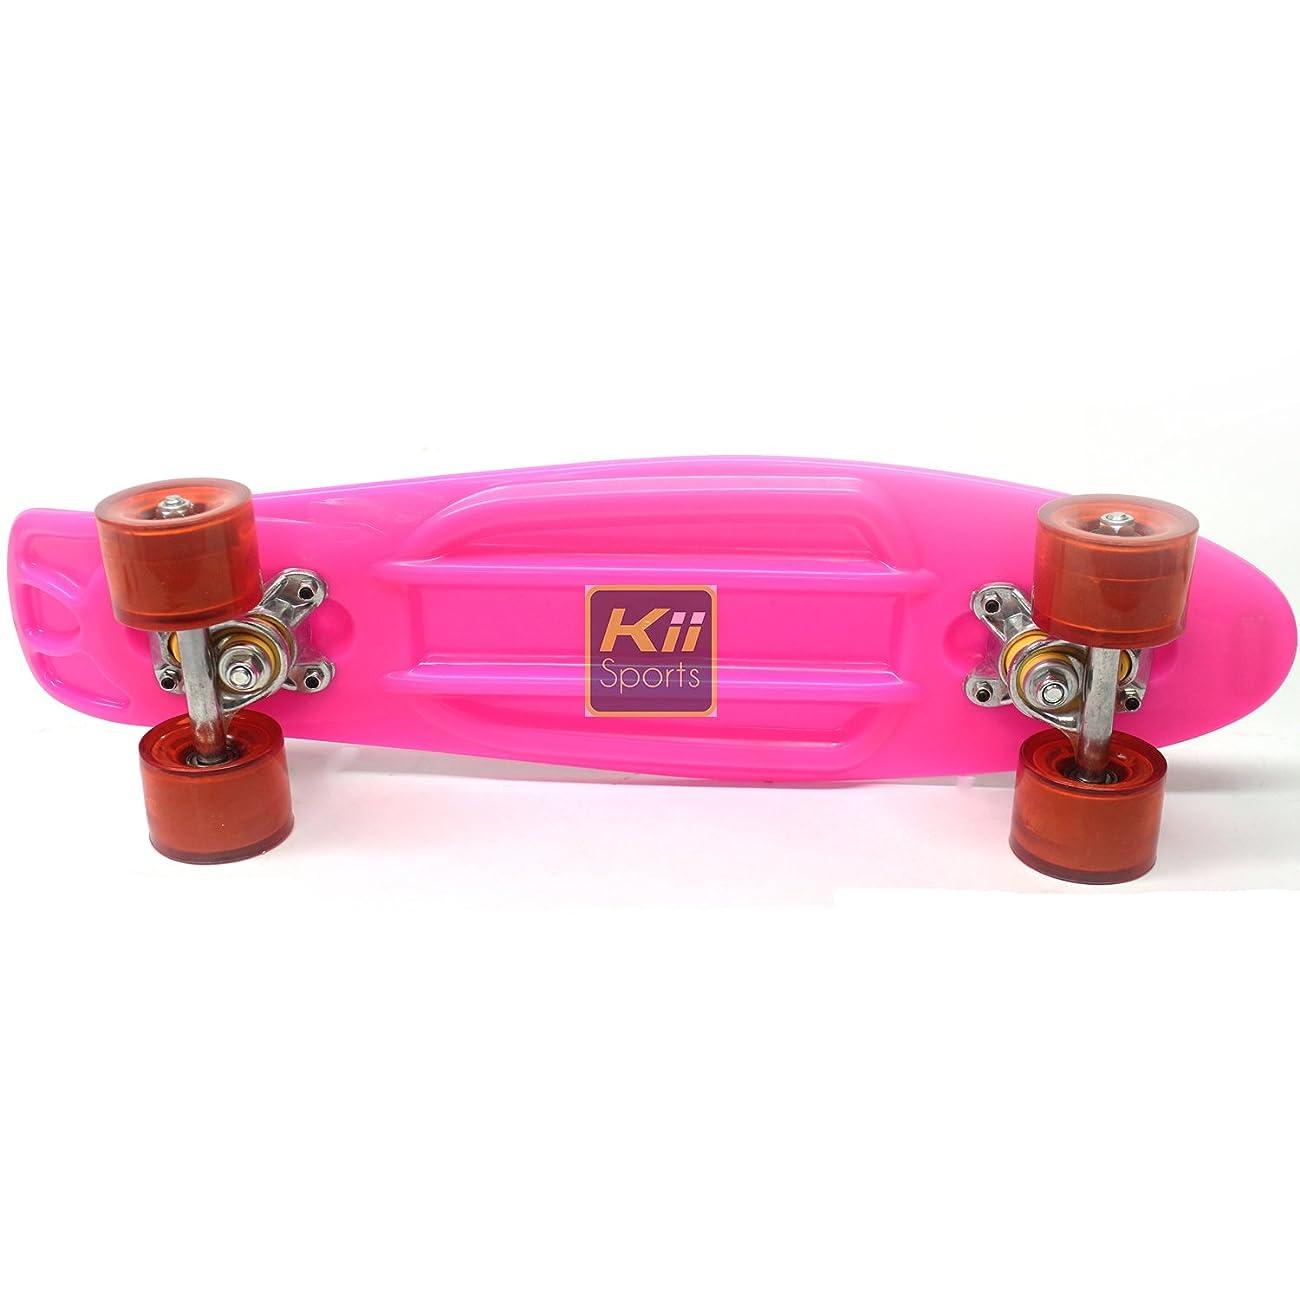 Plastic Skateboard Penny Retro 22